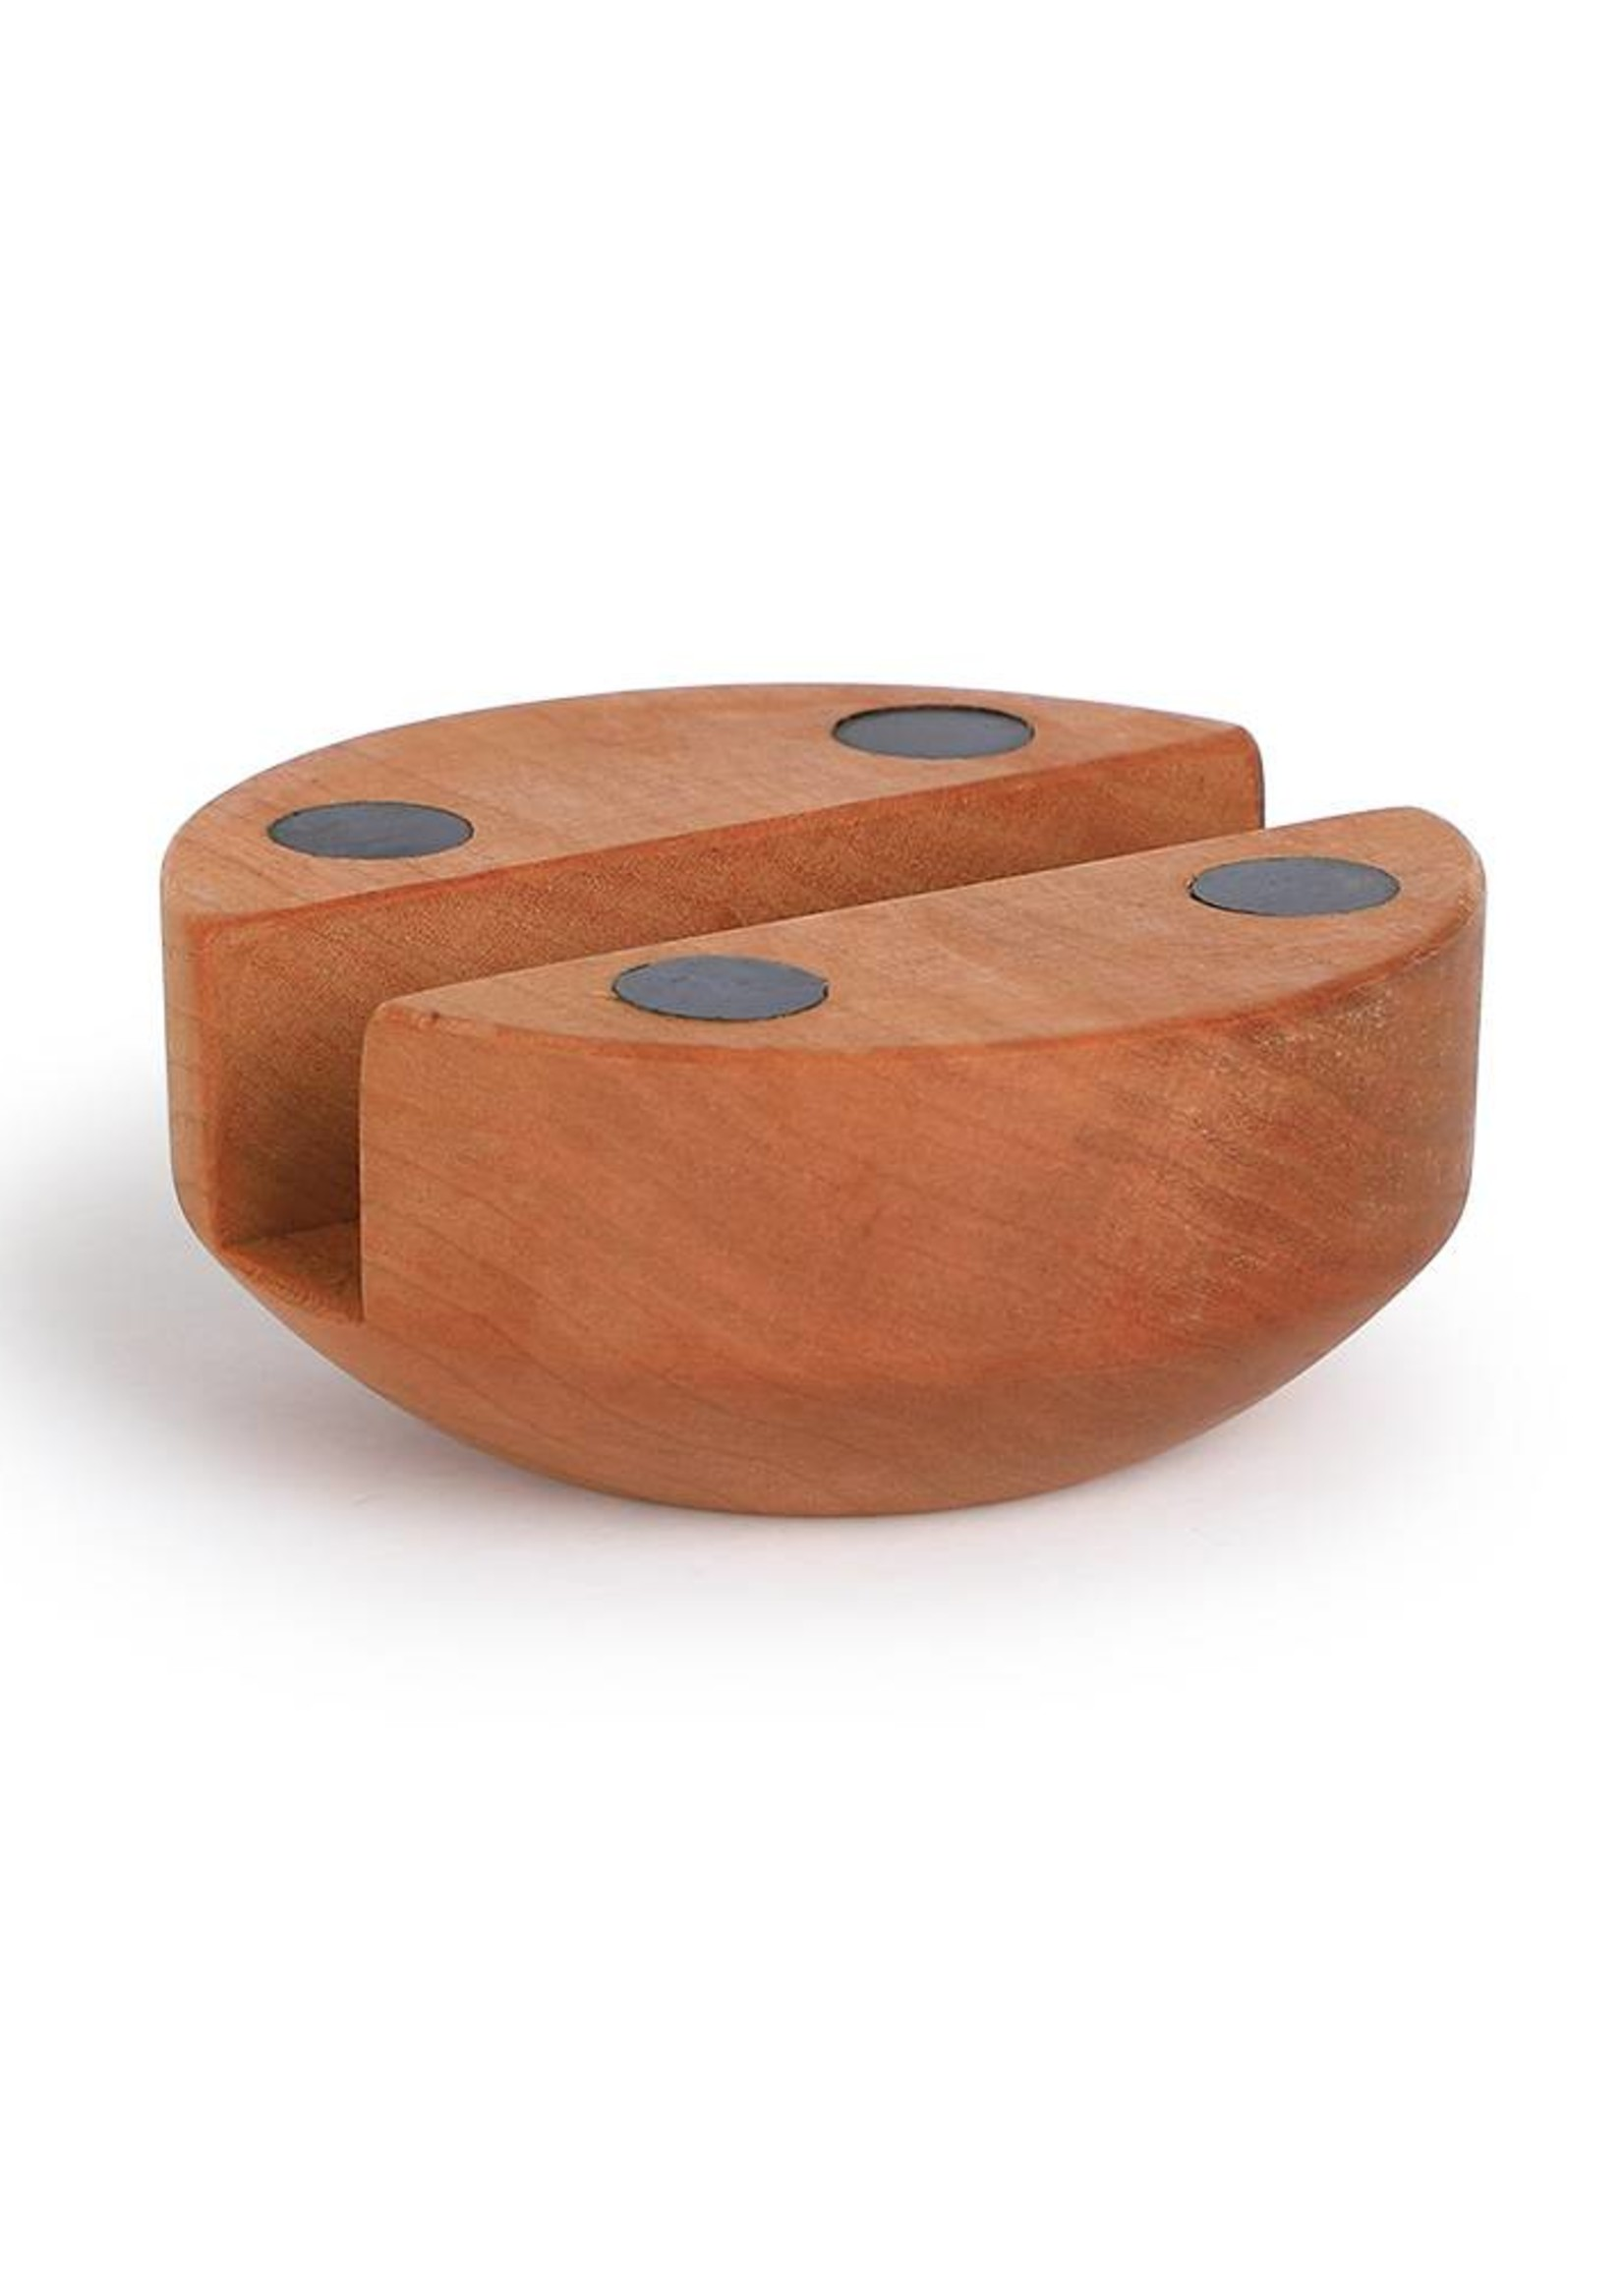 Vew-Do Vew-Do Zone Stand Up Balance Trainer Chocolate